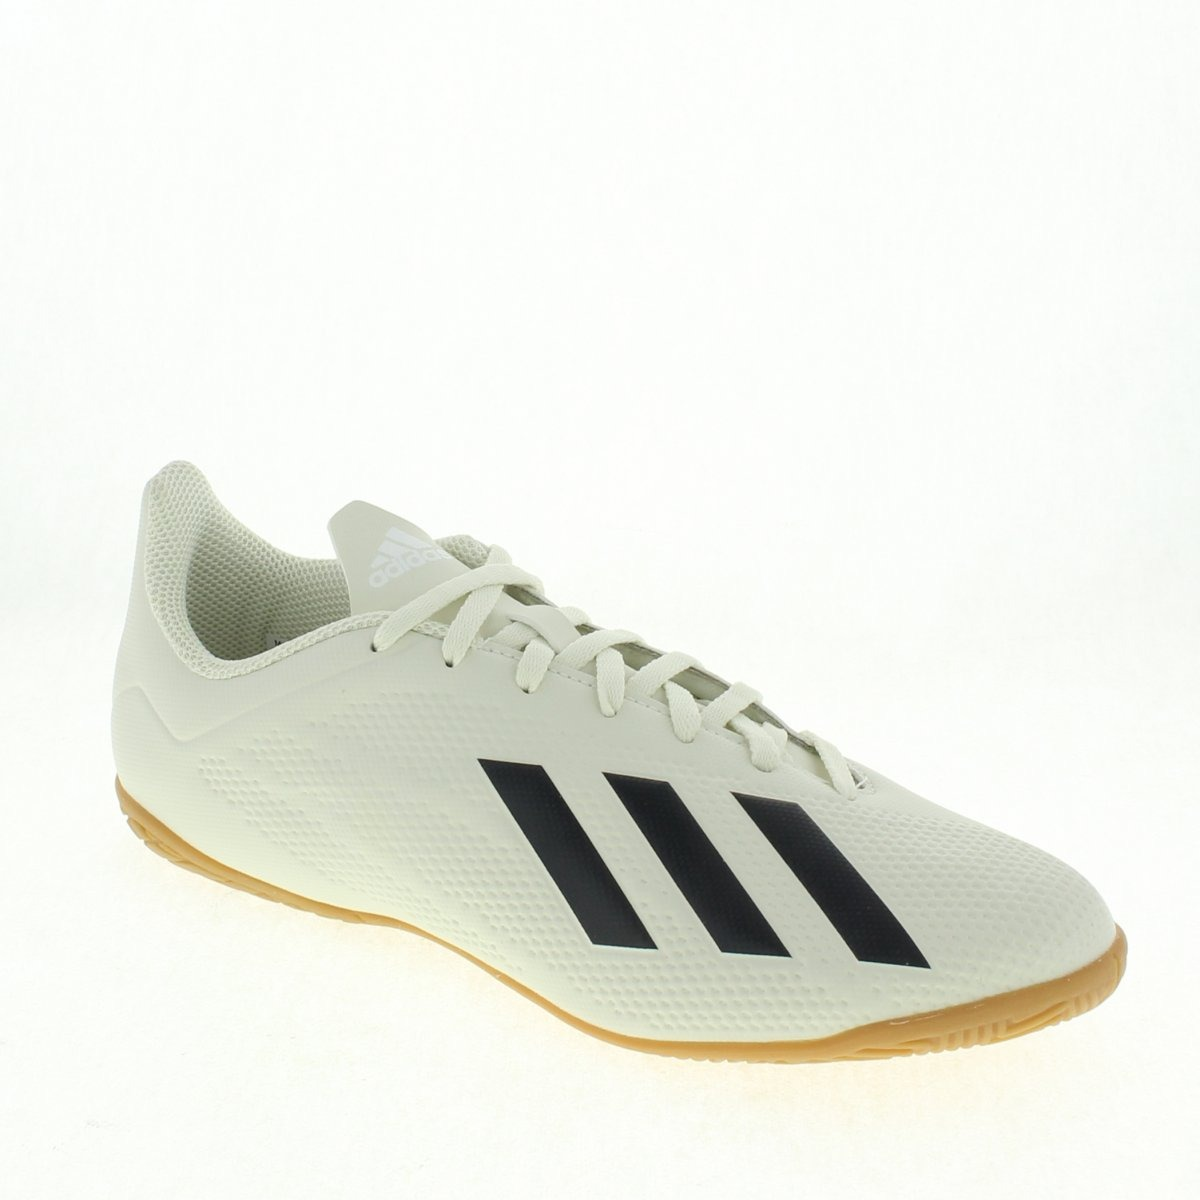 ahorros fantásticos lo mas baratas venta directa de fábrica Chuteira Futsal Tenis adidas X Tango 18.4 Db2485 Original